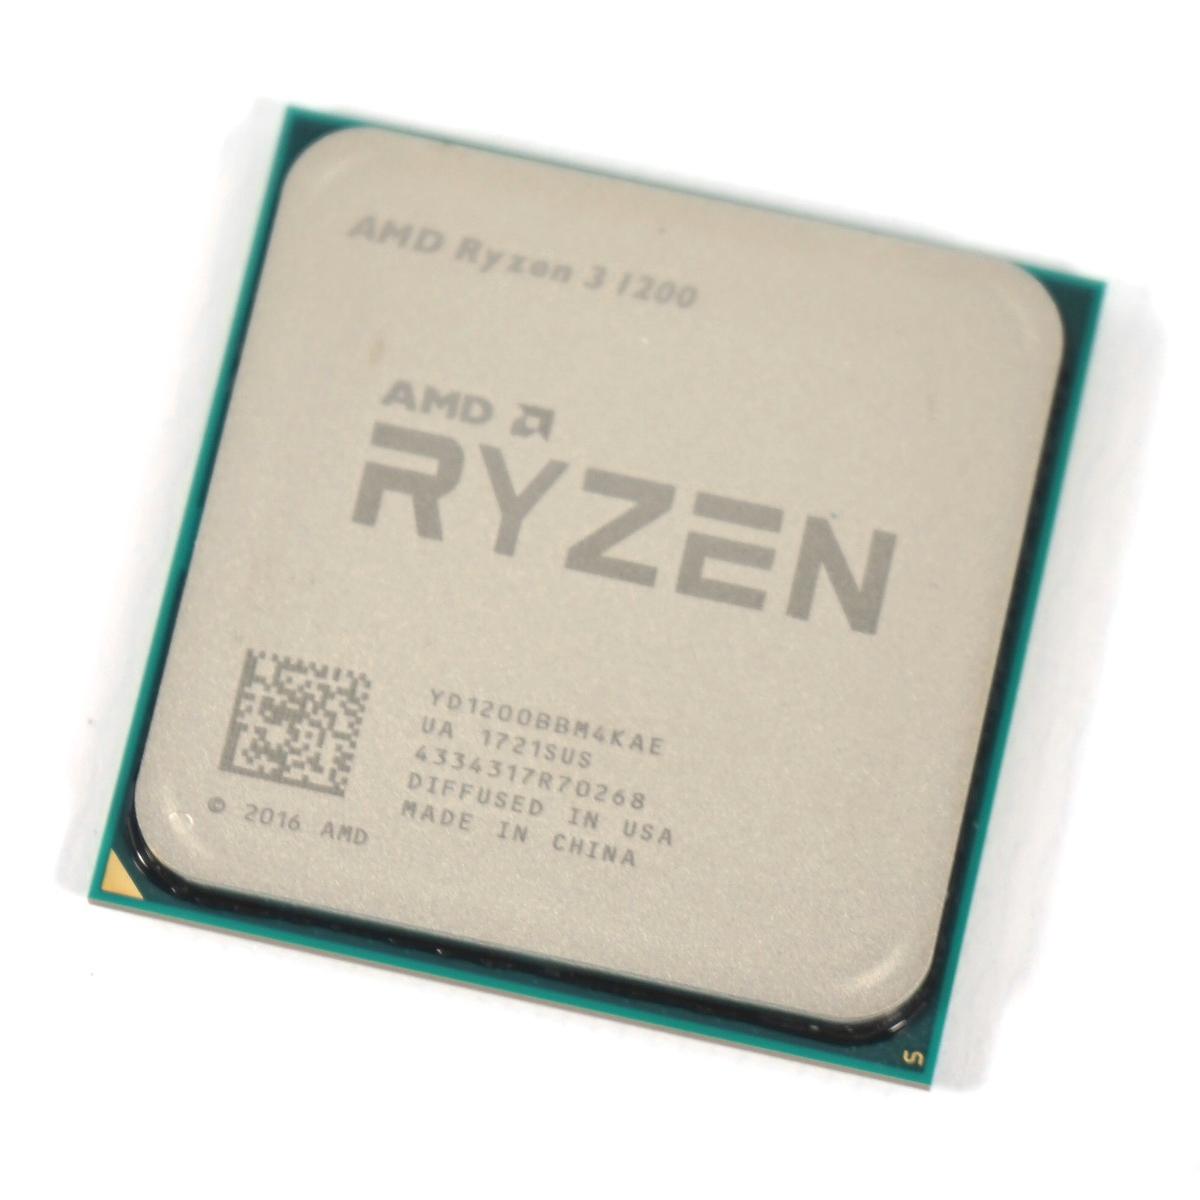 AMD Ryzen 3 1200 R3 1200 3.1 GHz 쿼드 코어 쿼드 스레드 CPU 프로세서 소켓 AM4 데스크탑 Cpu